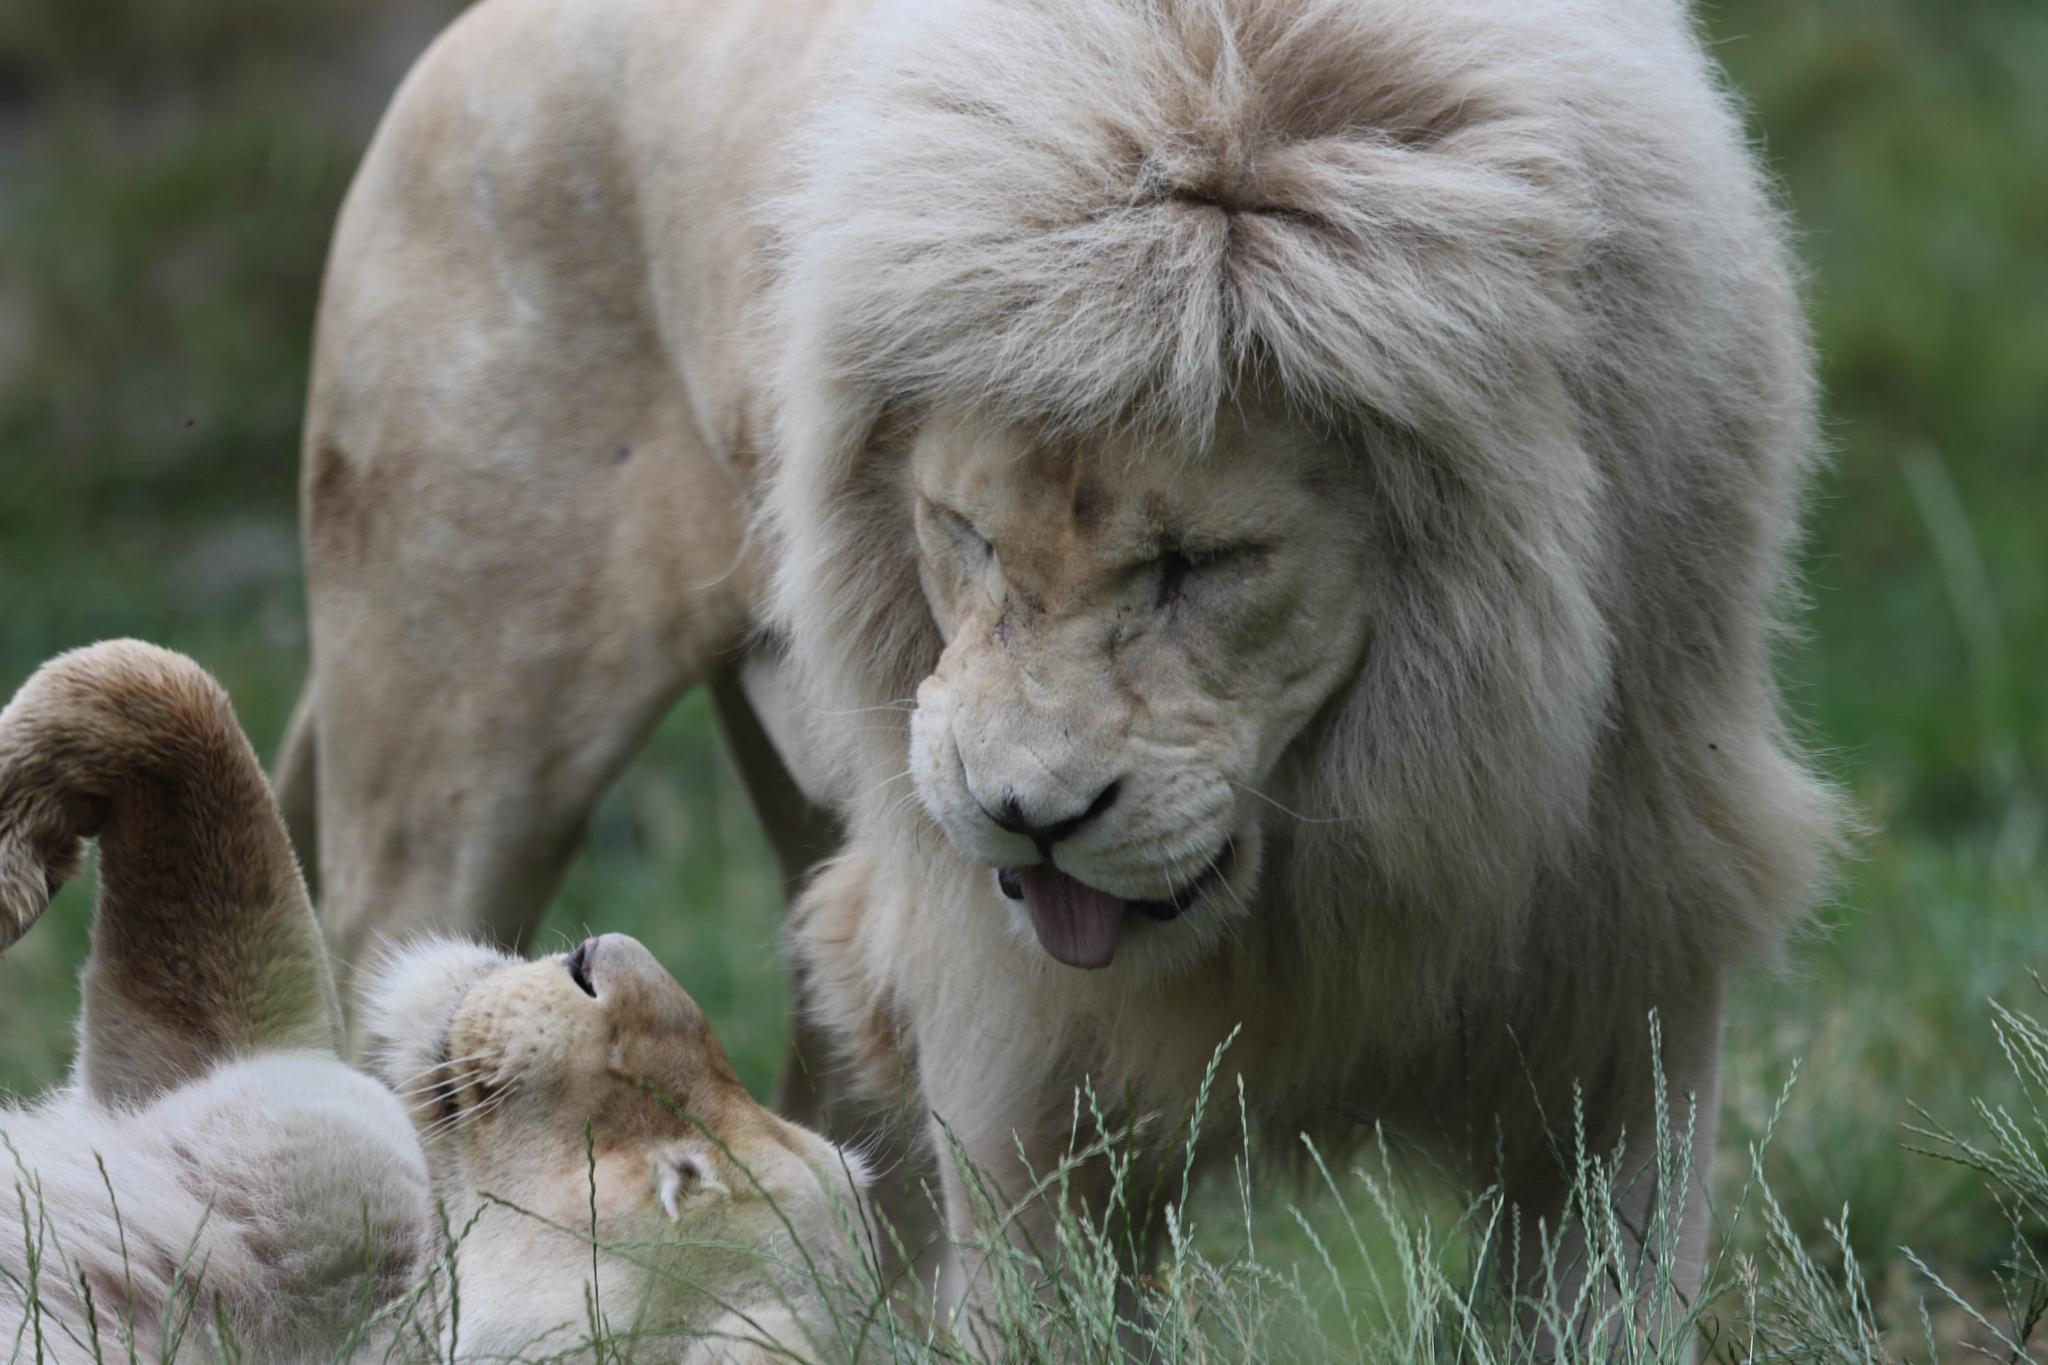 lion by emmanuel liegeois